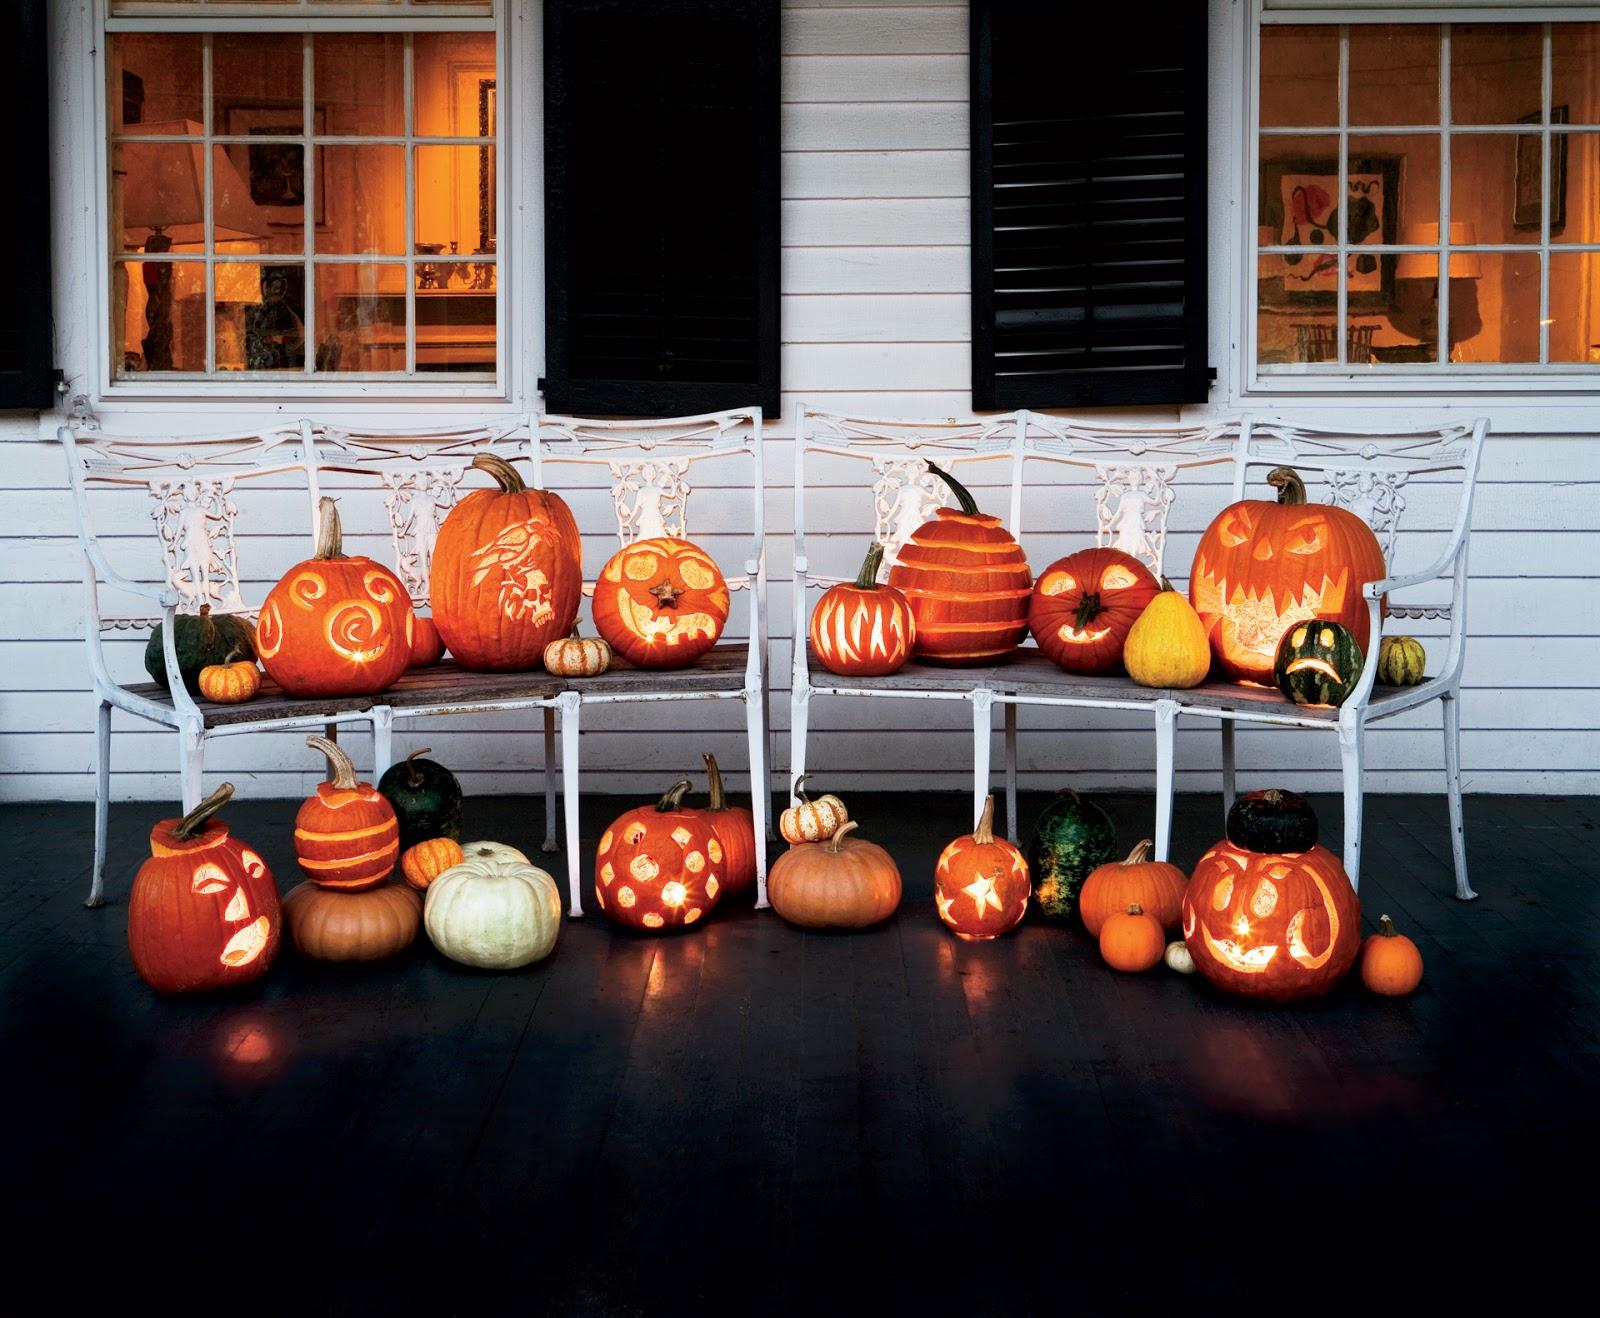 Halloween Decoration Ideas 2017 & Top Best Halloween Decoration Ideas For Men Women And Kids